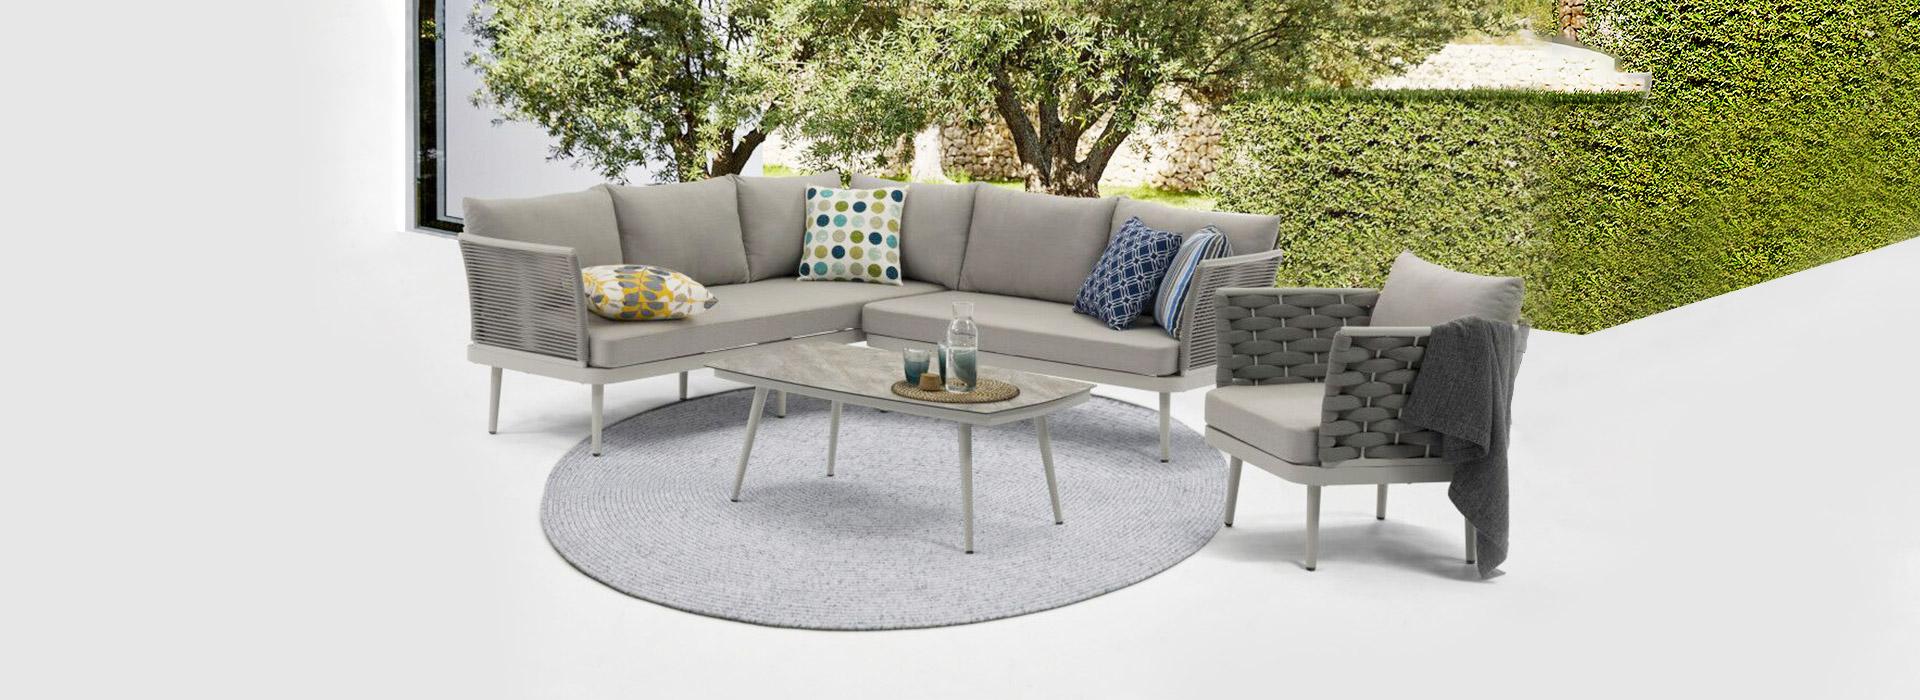 st-moritz-lounge-set